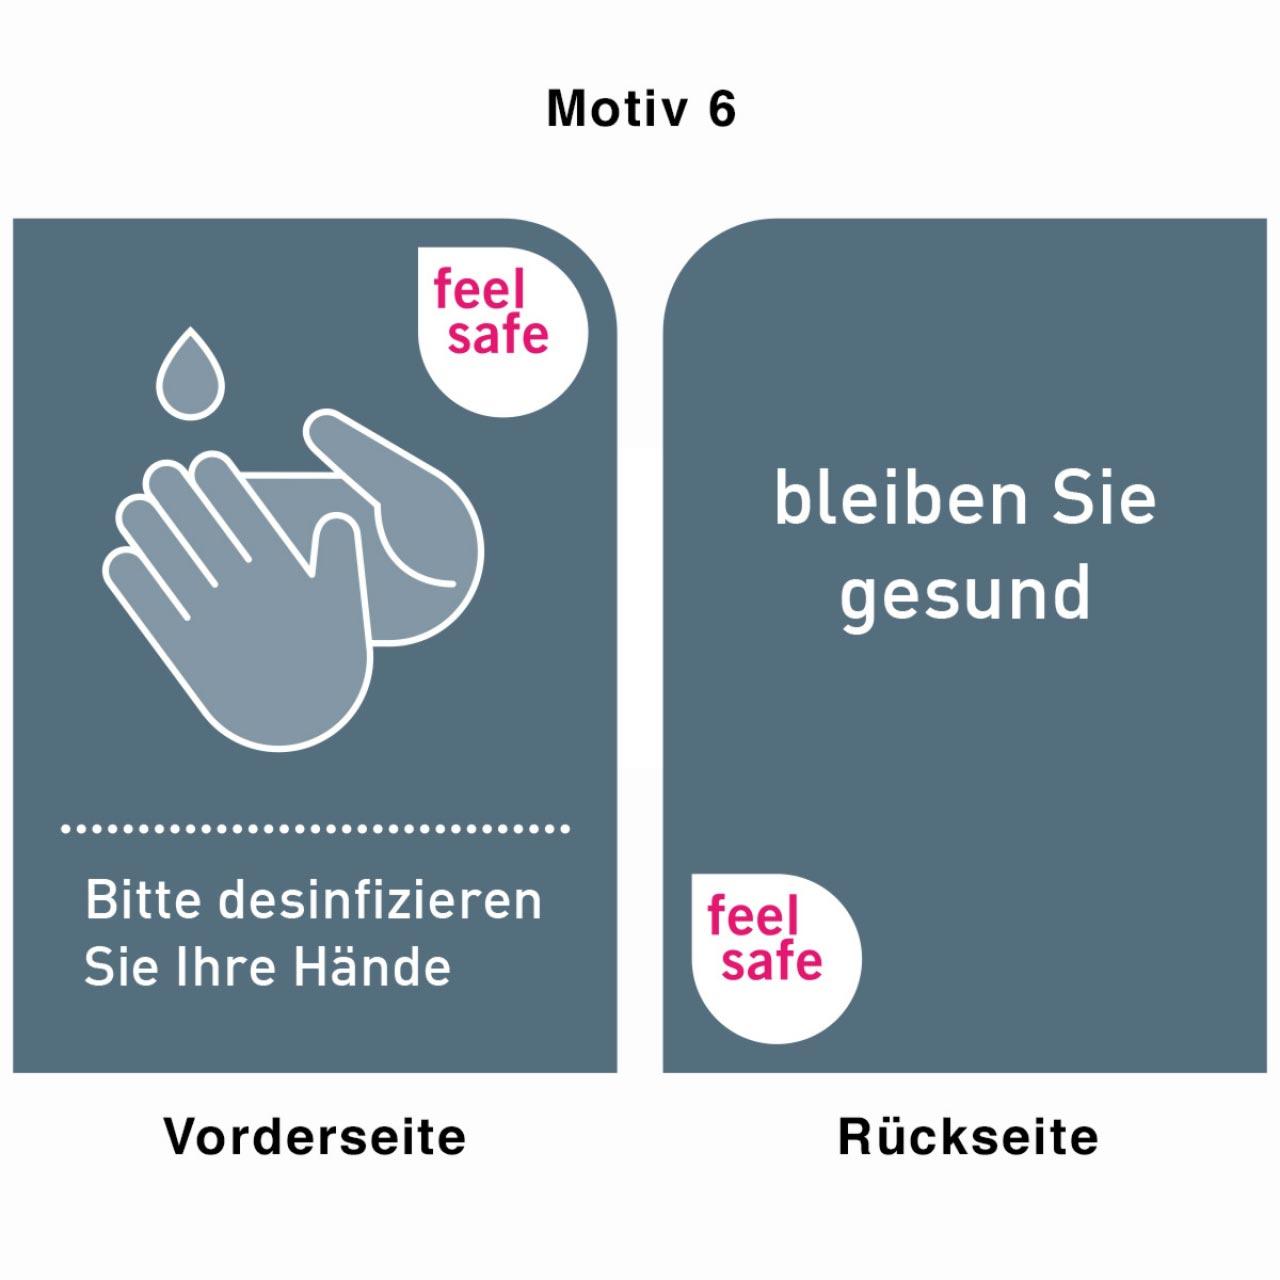 Desinfektionsständer - Motiv 6